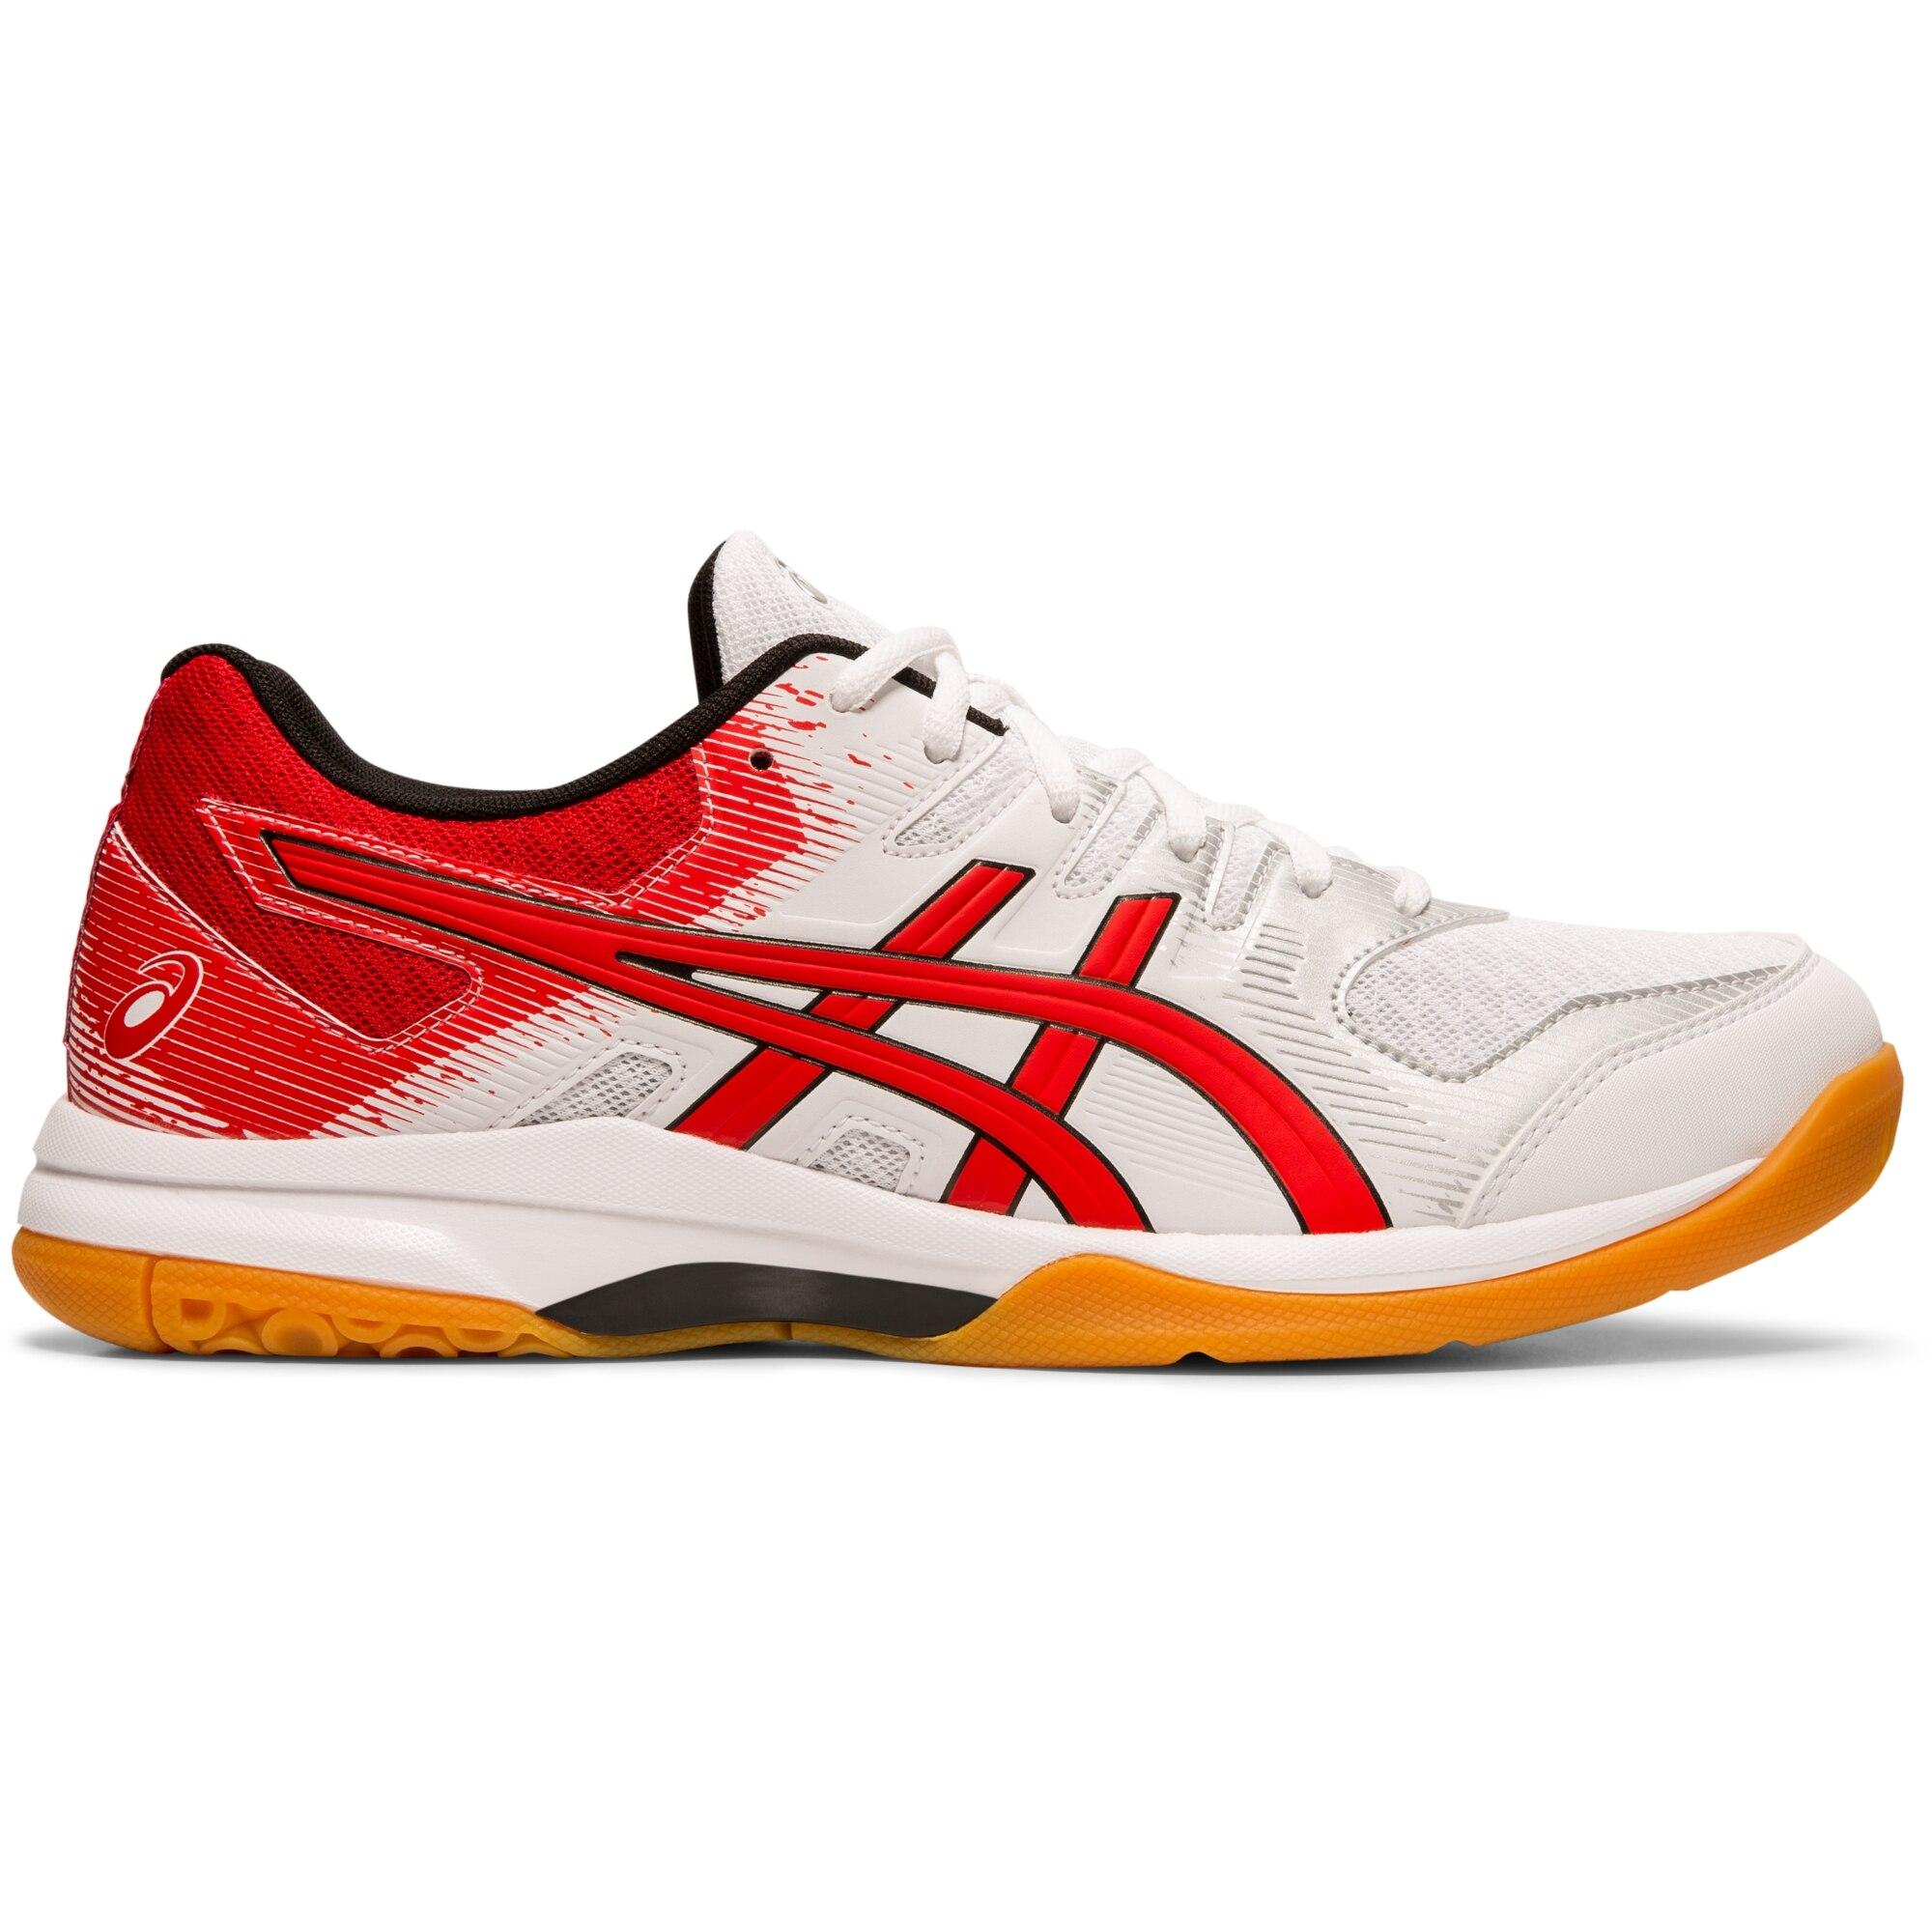 ottaa kiinni iso alennus parhaat lenkkarit Asics Mens GEL-Rocket 9 Indoor Court Shoes - White/Classic Red